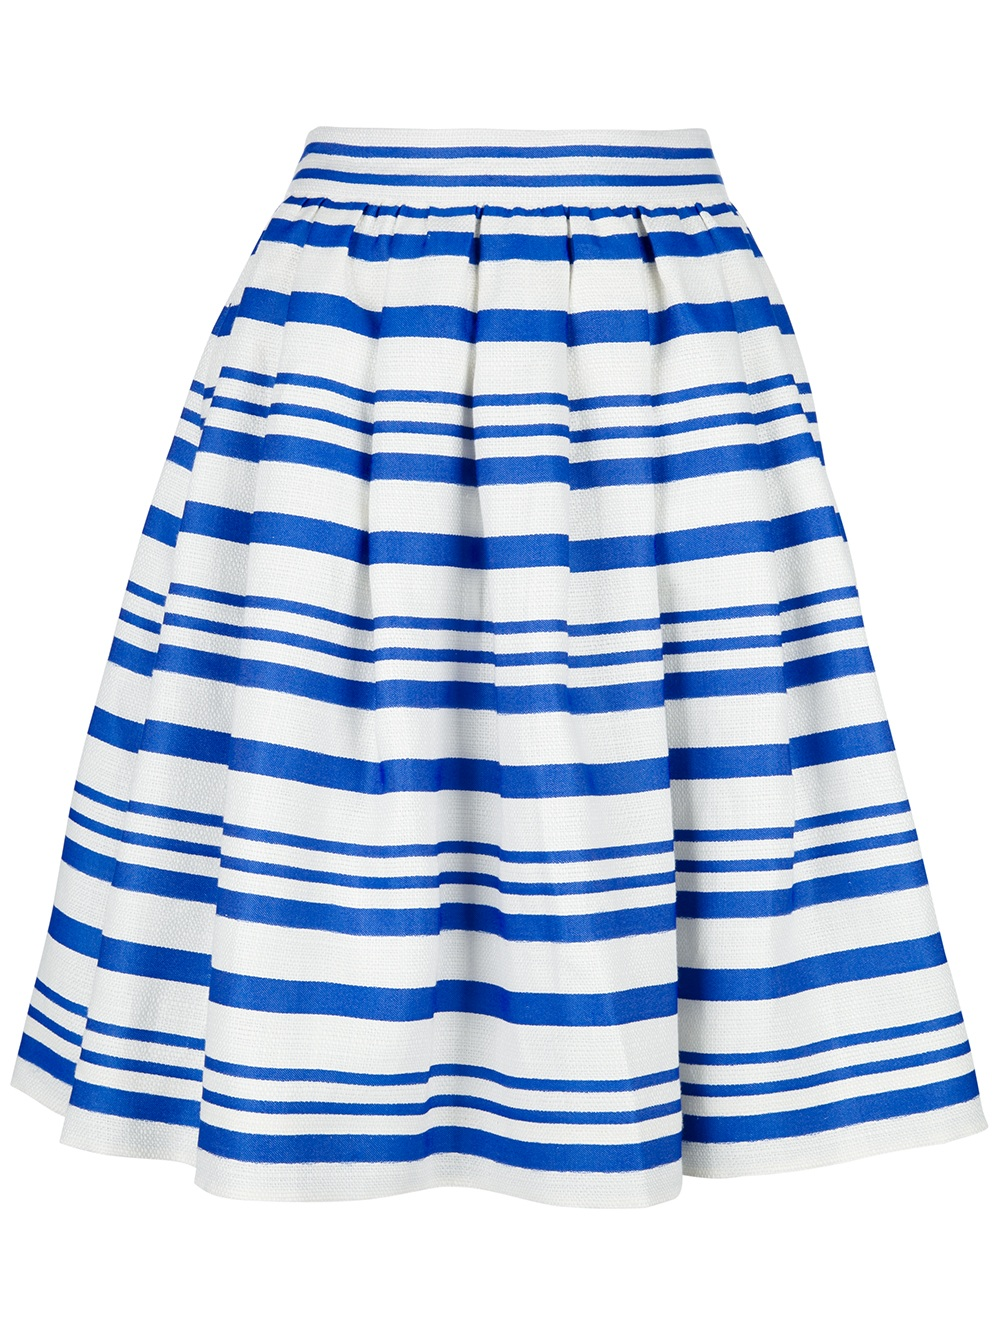 dolce gabbana striped skirt in blue white lyst